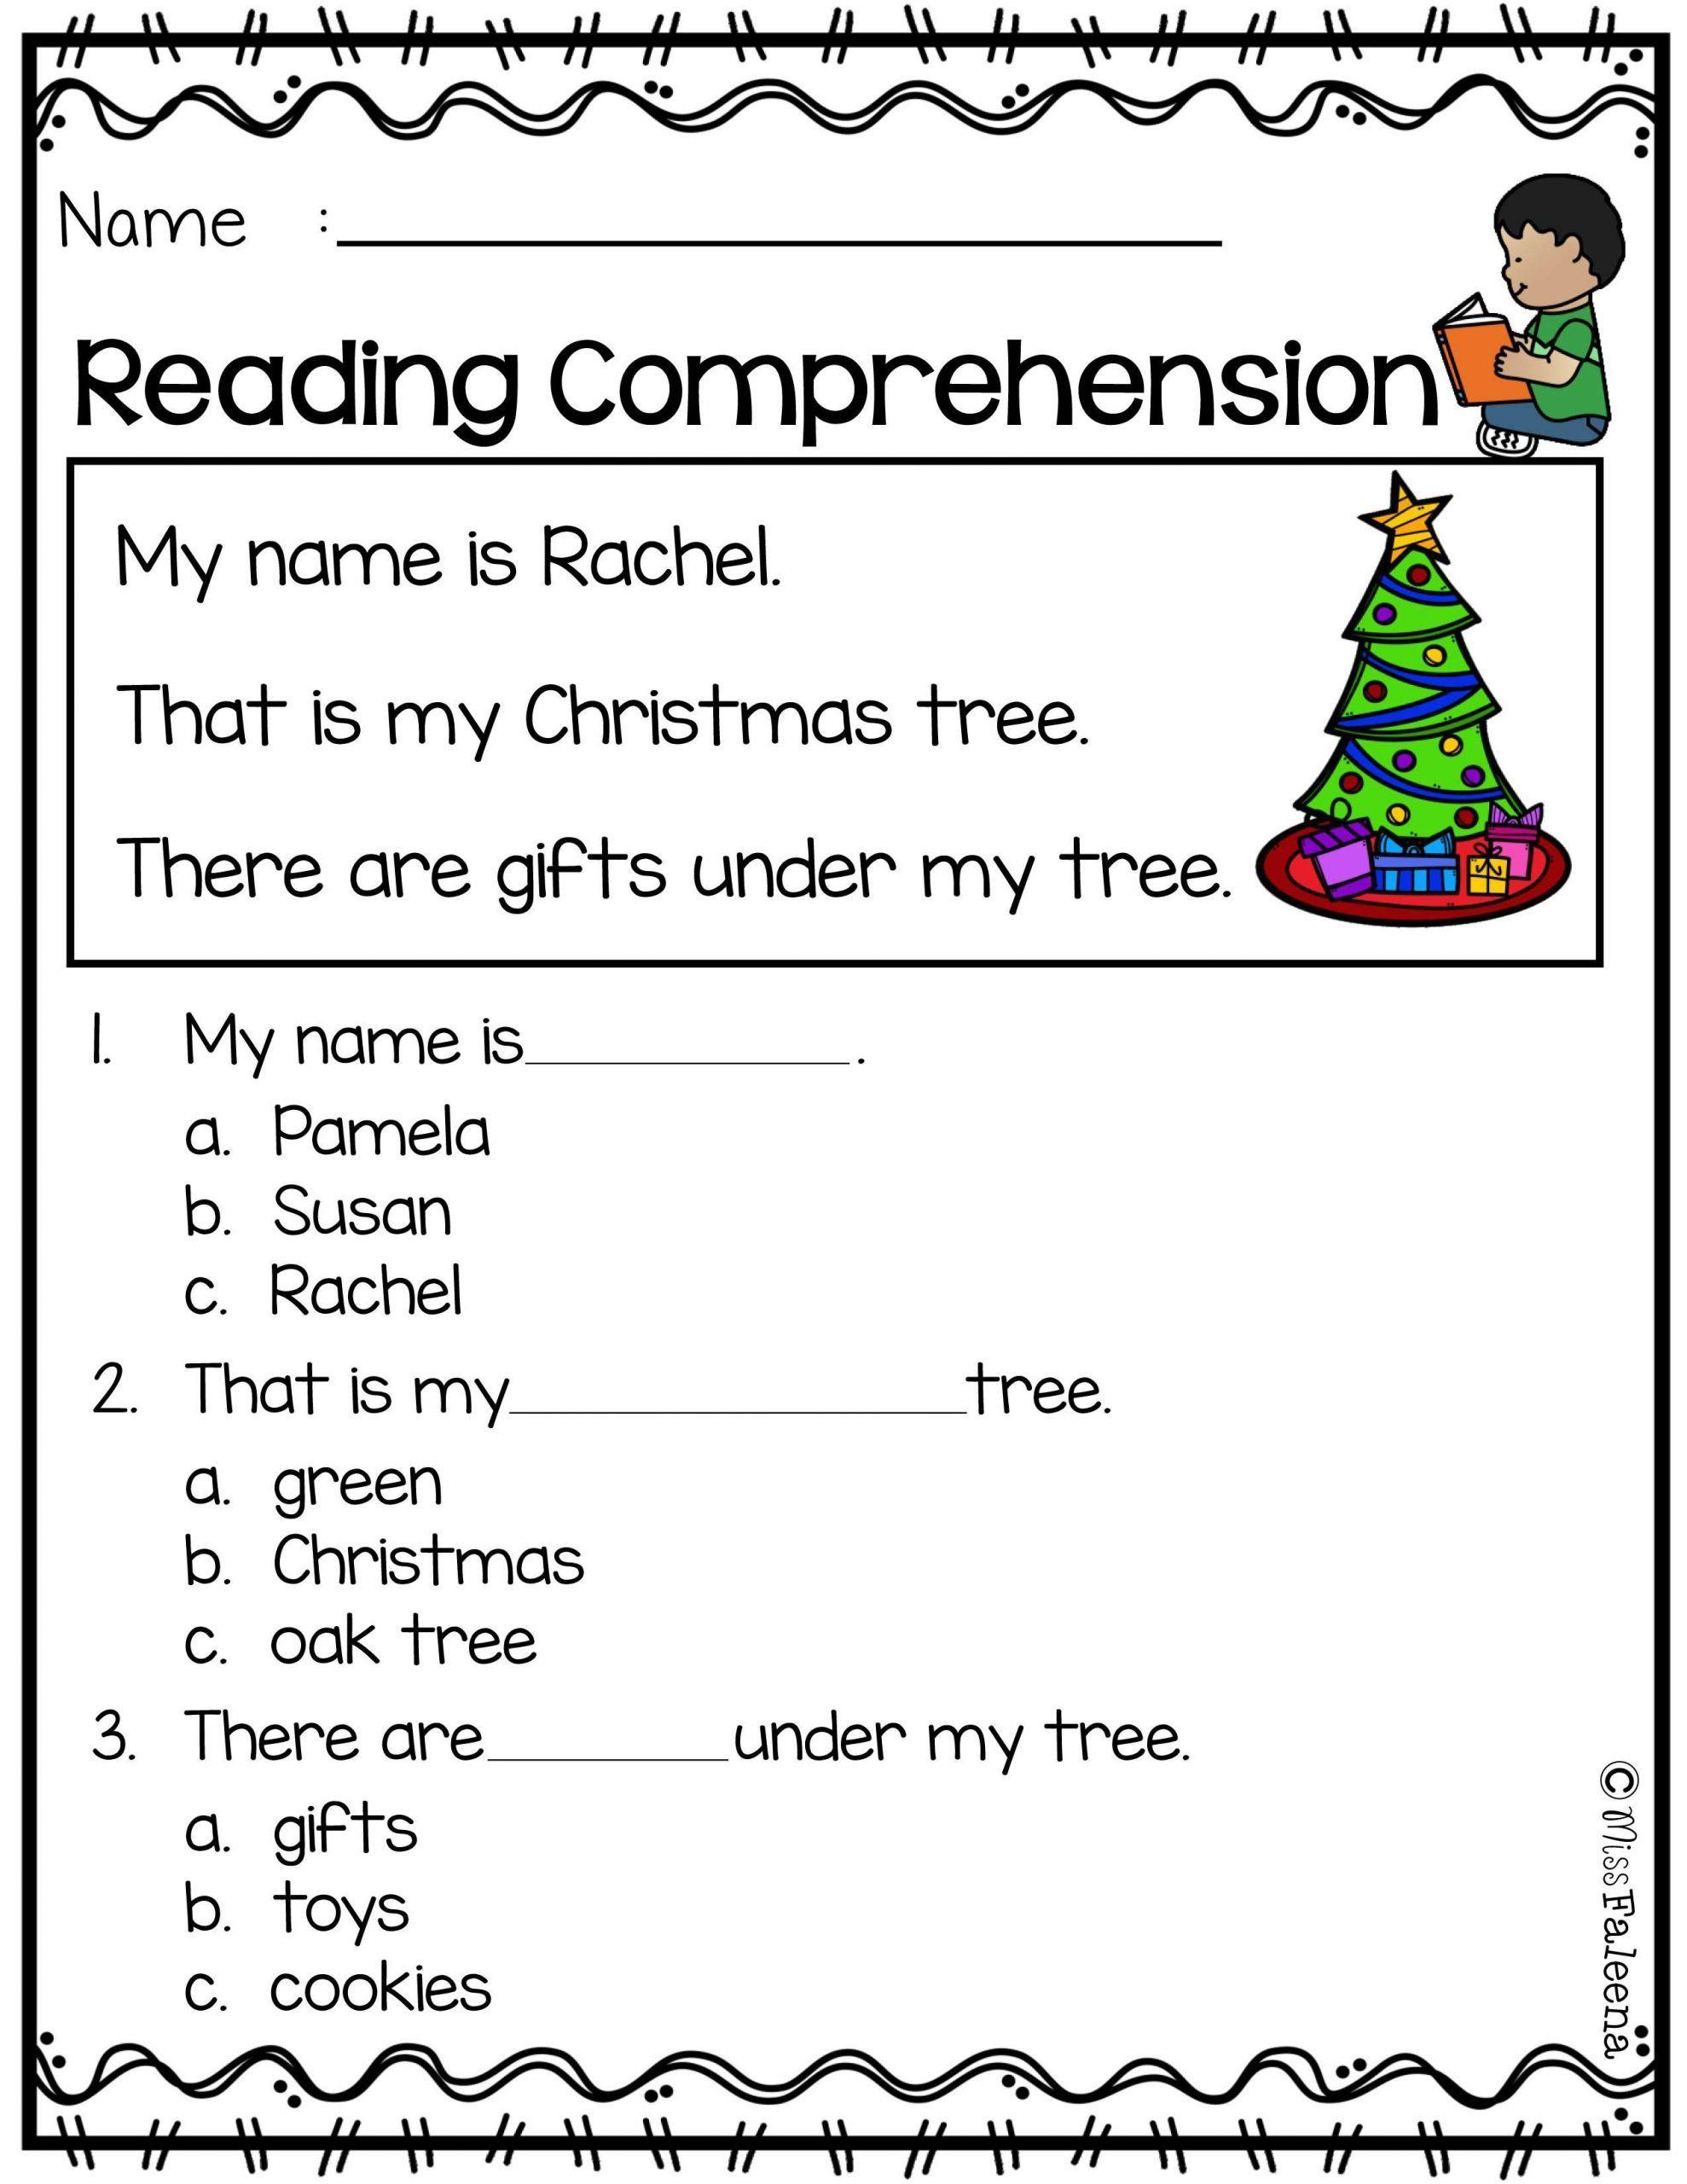 Christmas Math Coloring Pages Az Coloring Pages Math Coloring Christmas Math Christmas Math Worksheets